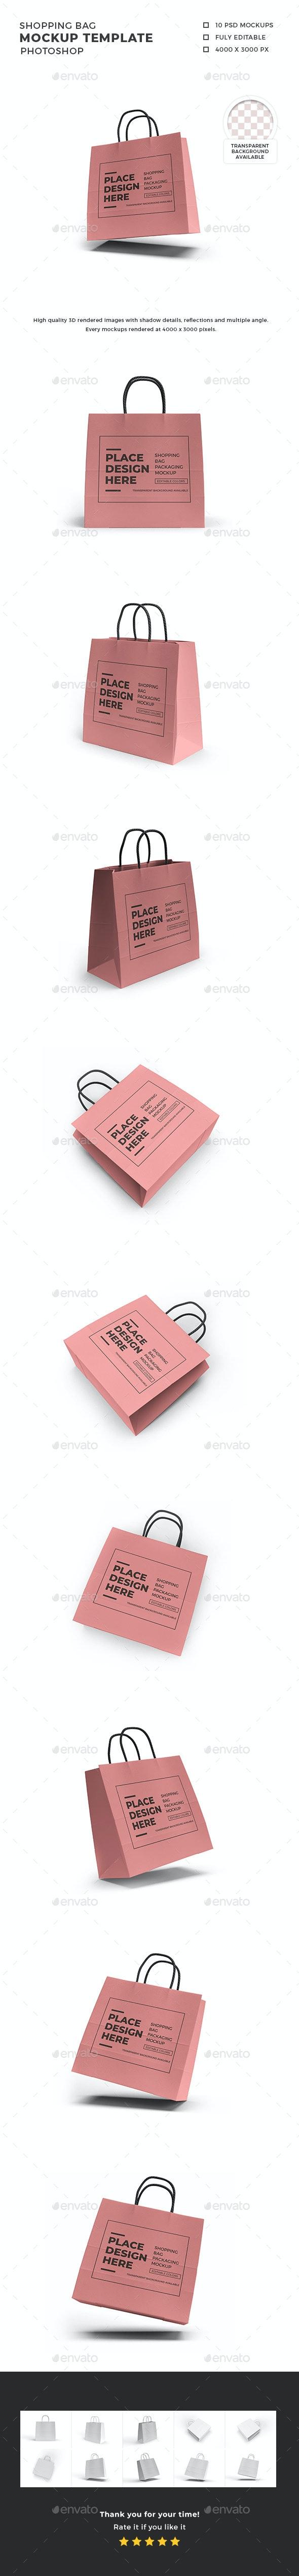 Shopping Bag Mockup Template Set - Packaging Product Mock-Ups